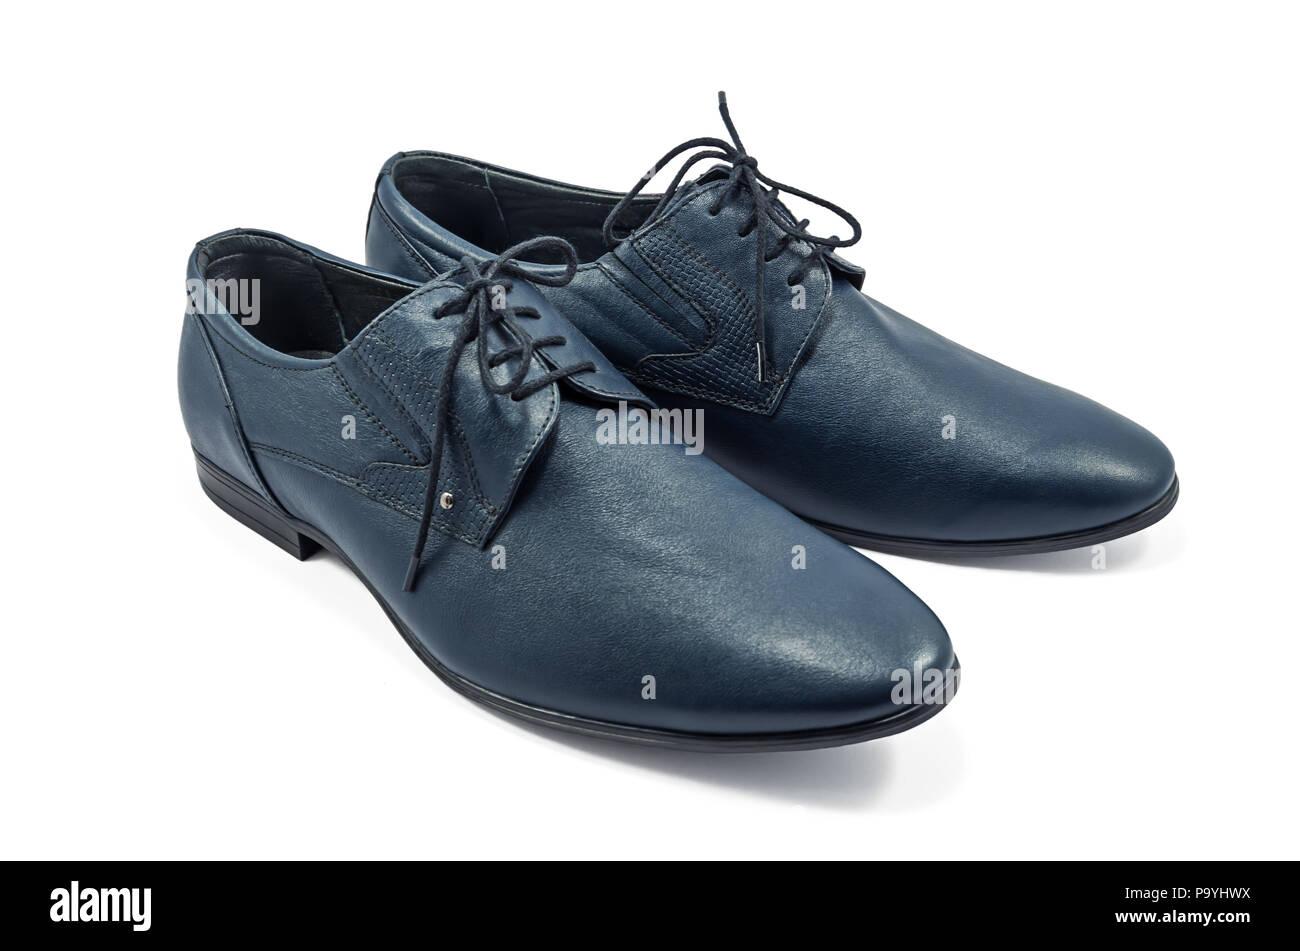 7353e10bf44eba Modische Schuhe für Männer Farbe blau